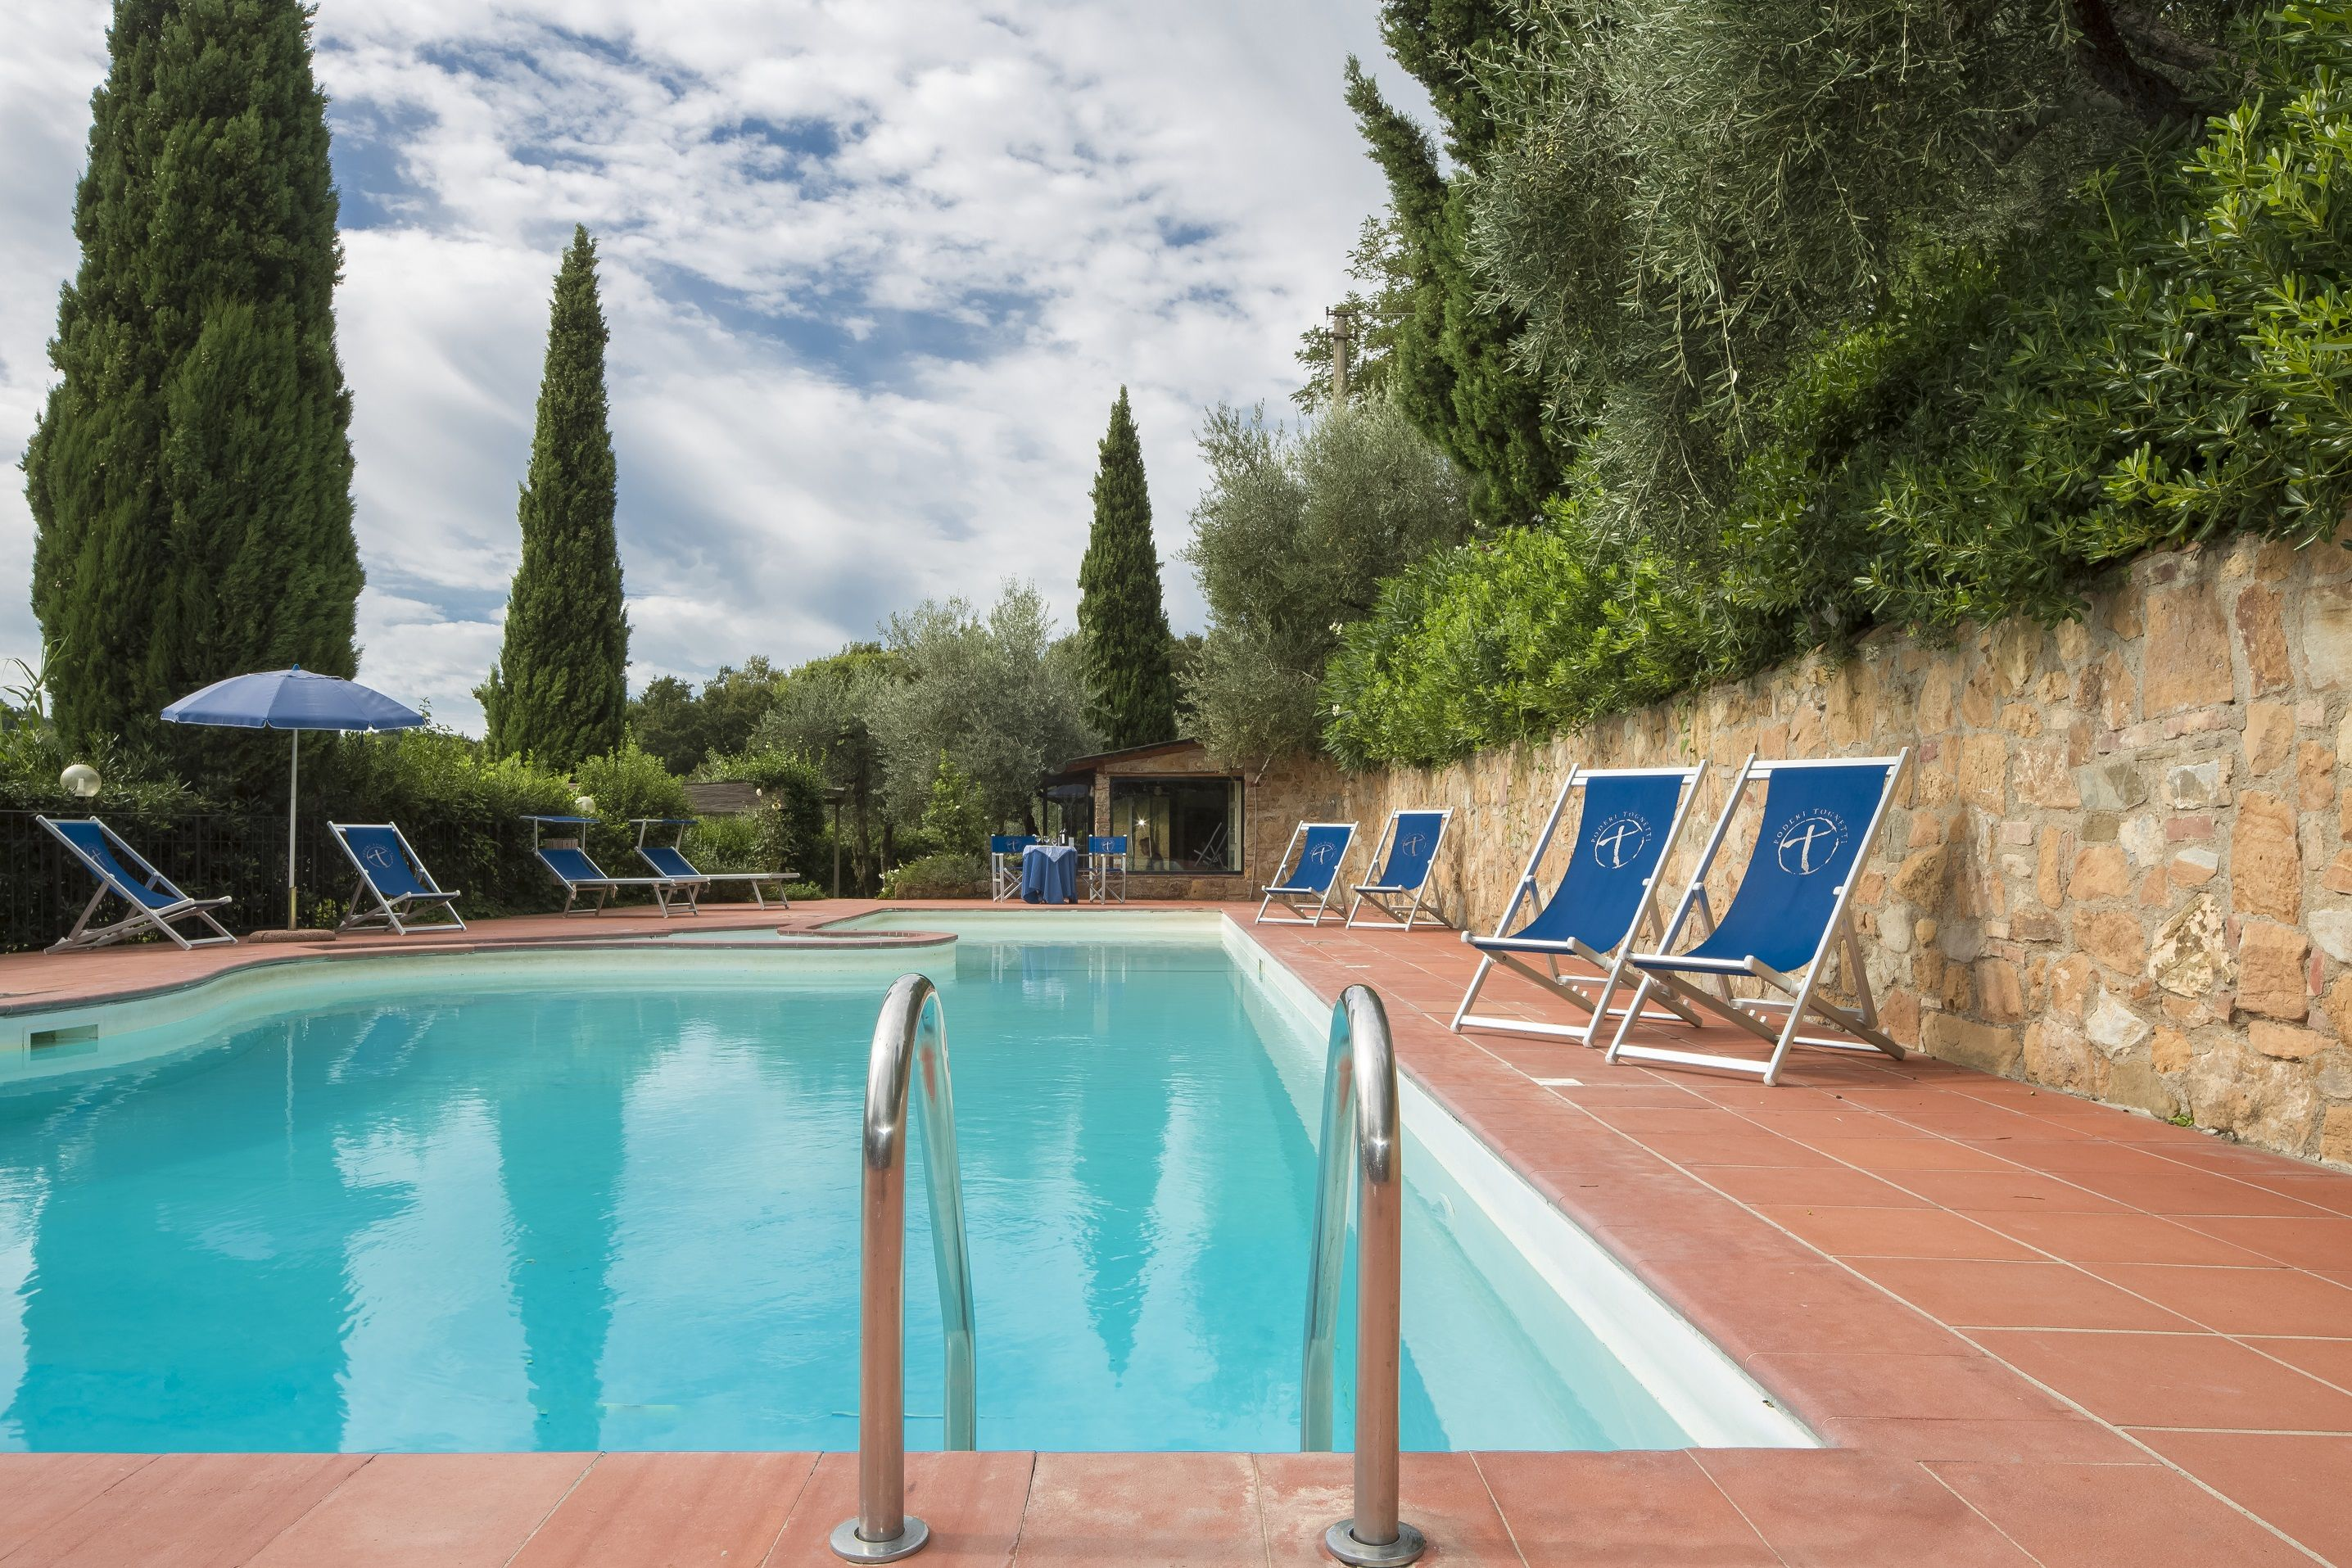 Apartment Agriturismo Il Sapito - Rossini Holiday Home photo 16445724